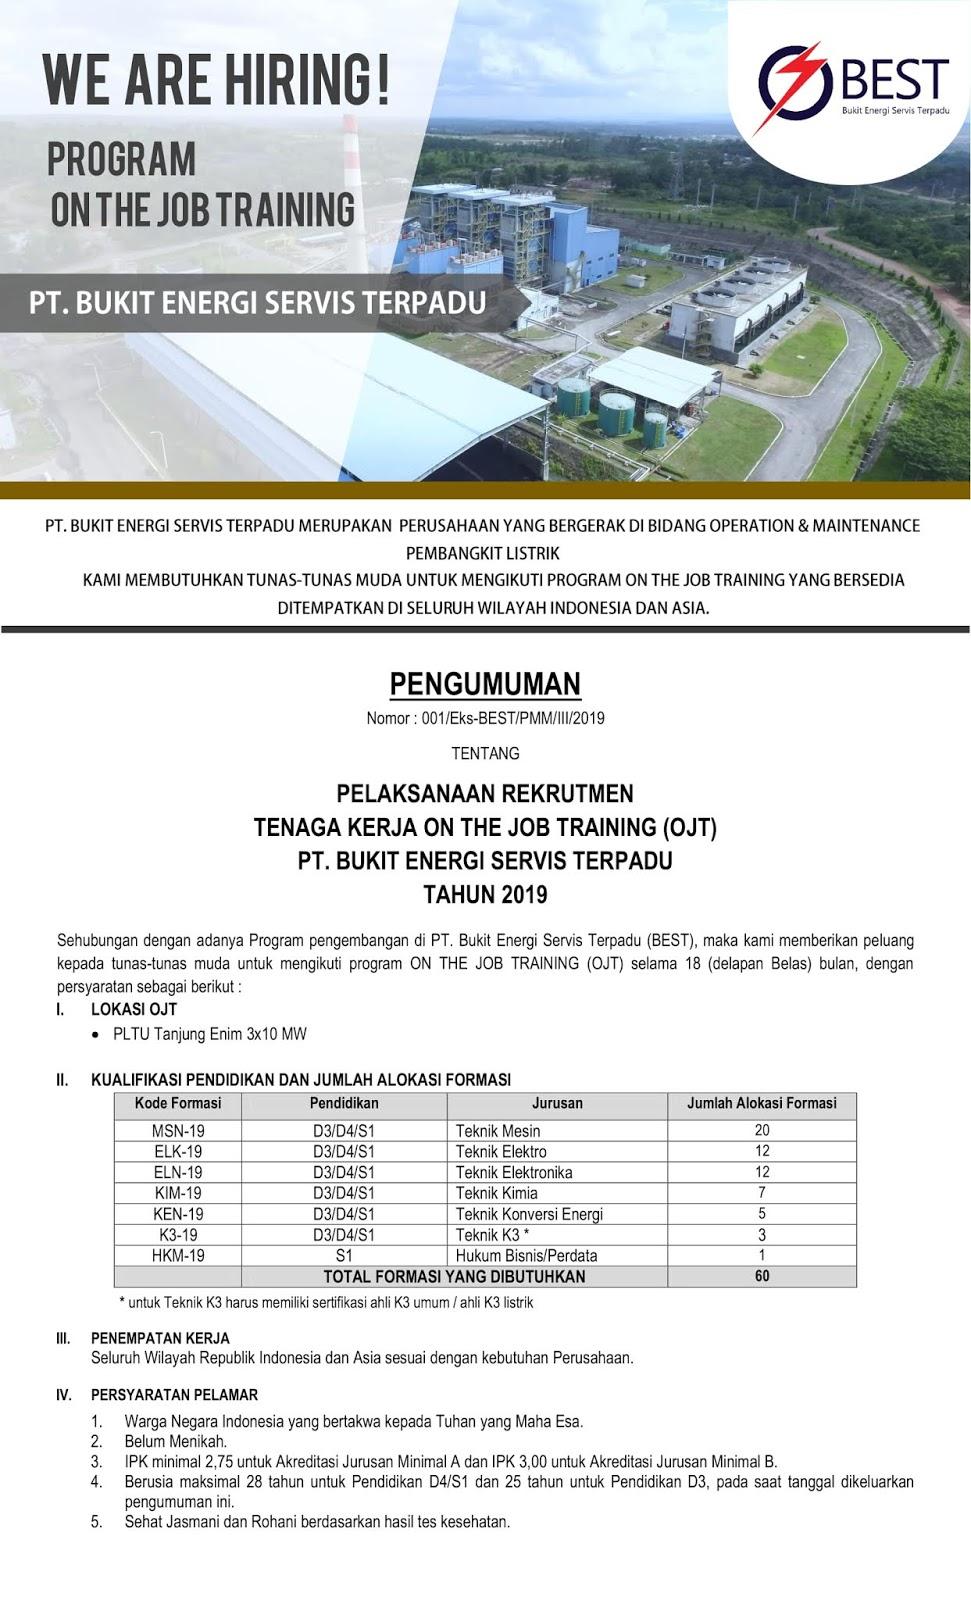 Lowongan Kerja PT Bukit Energi Servis (PT Bukit Asam Group) Tahun 2019